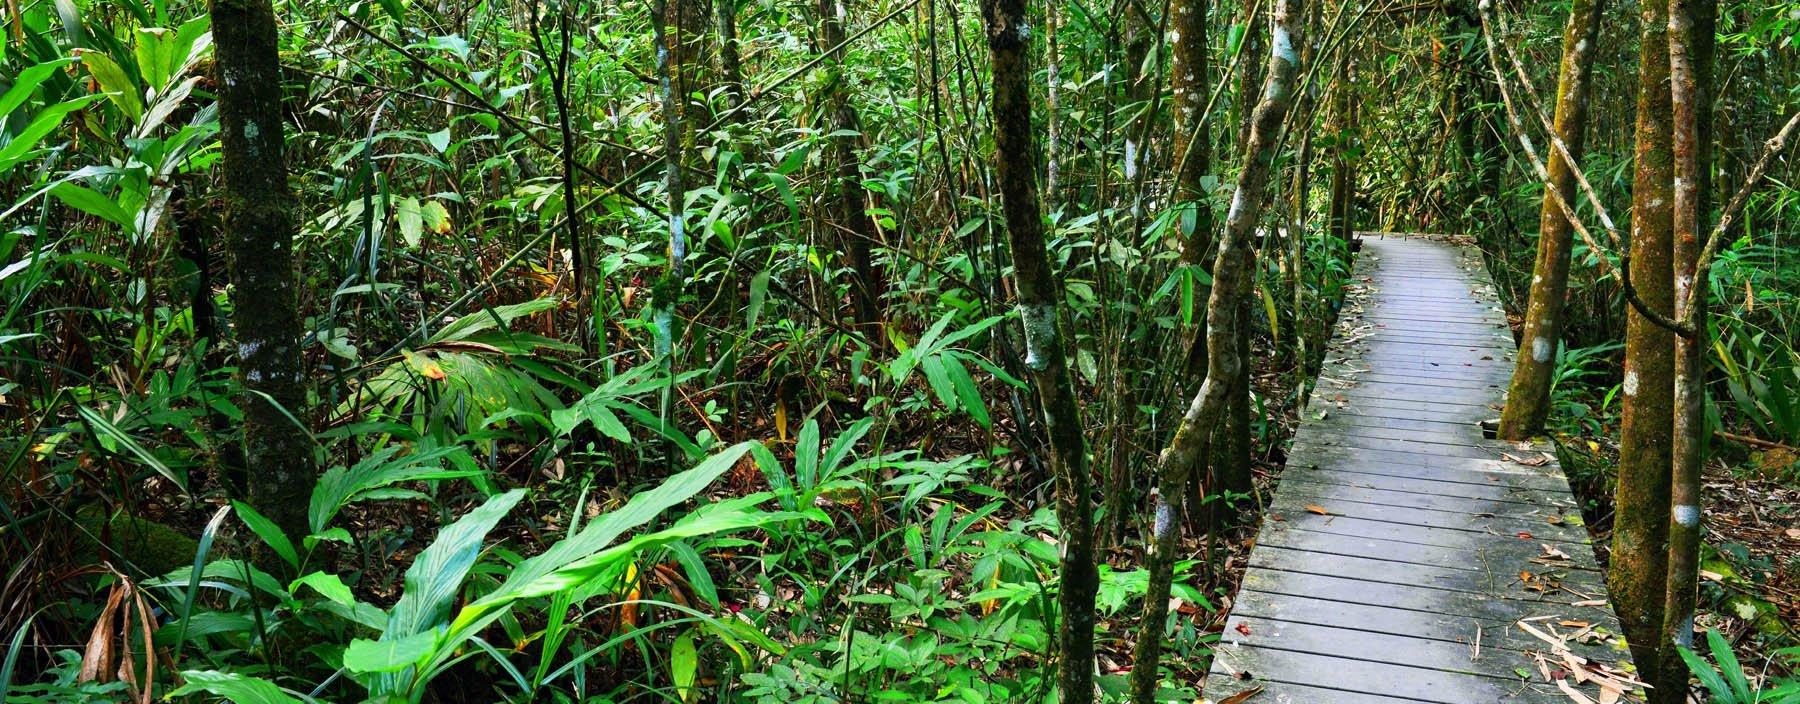 th. khao yai national park, khao yai np (7).jpg